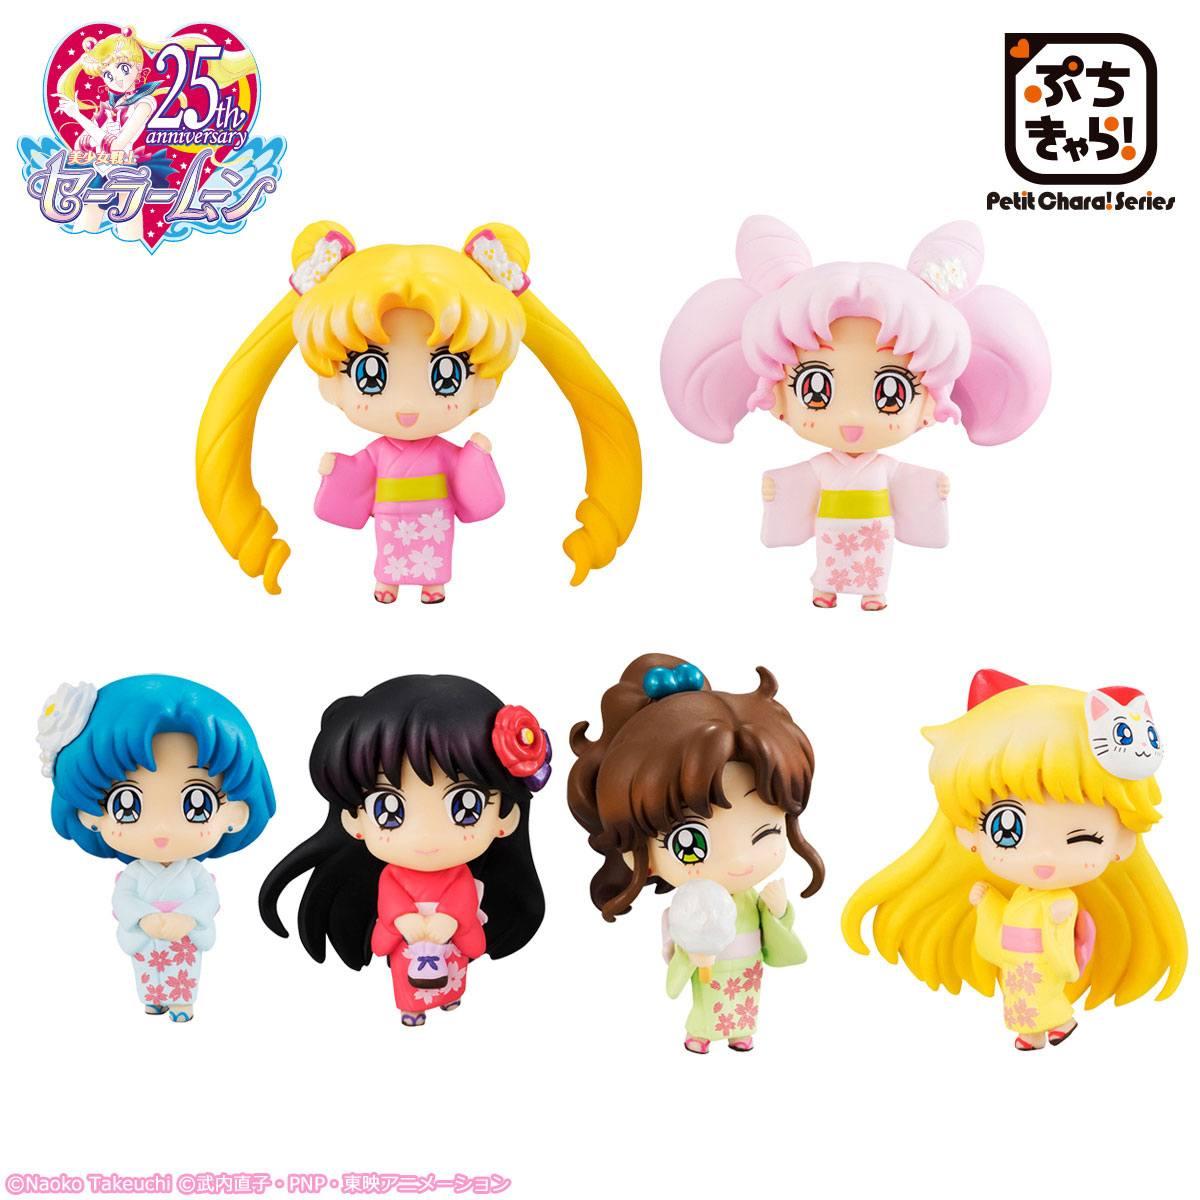 Sailor Moon Petit Chara Trading Figure 6 cm Cherry Blossom Festival Ver. Assortment (6)